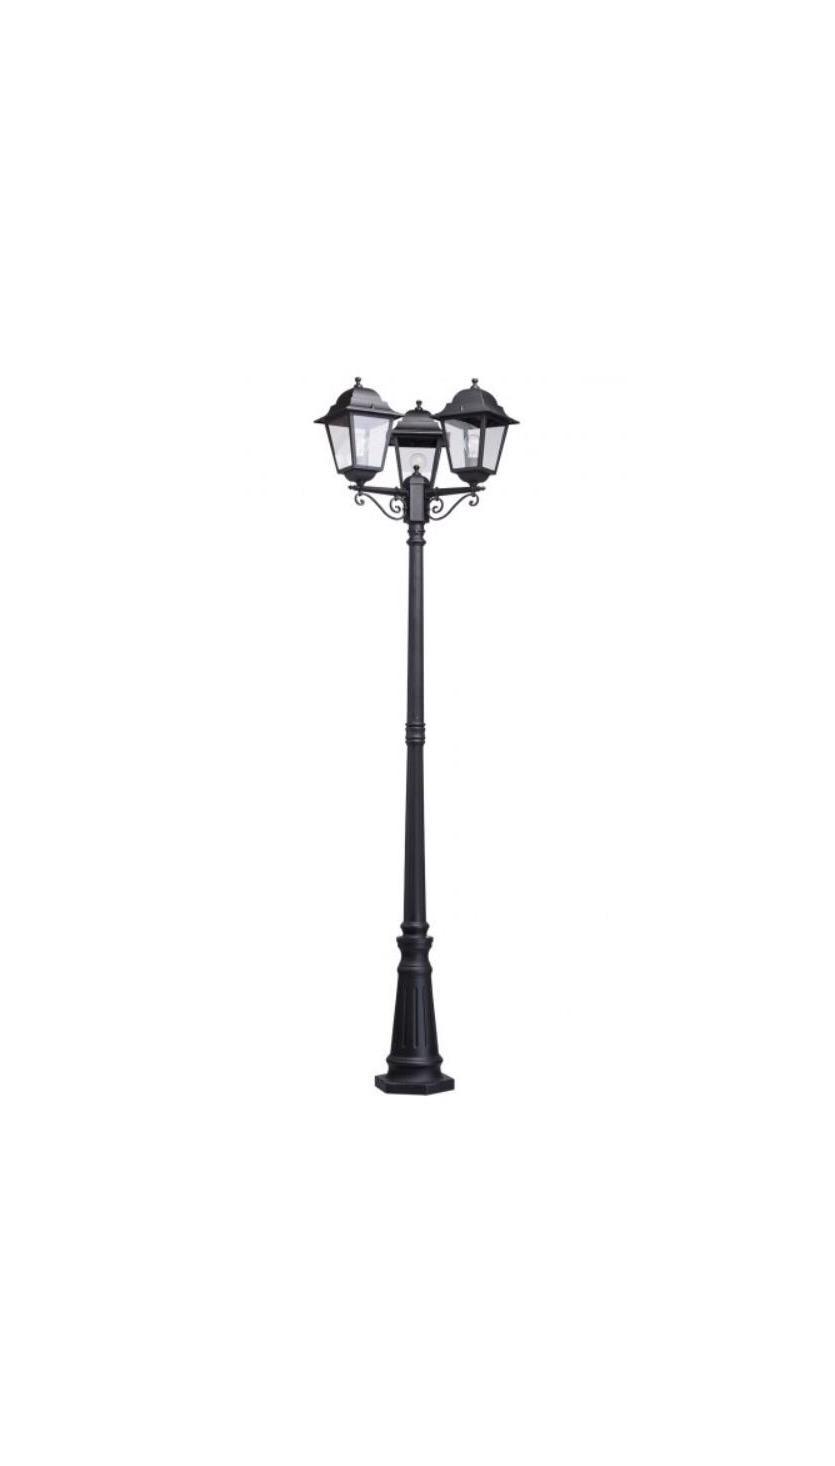 Parka laterna, Park lantern, Парковый фонарь